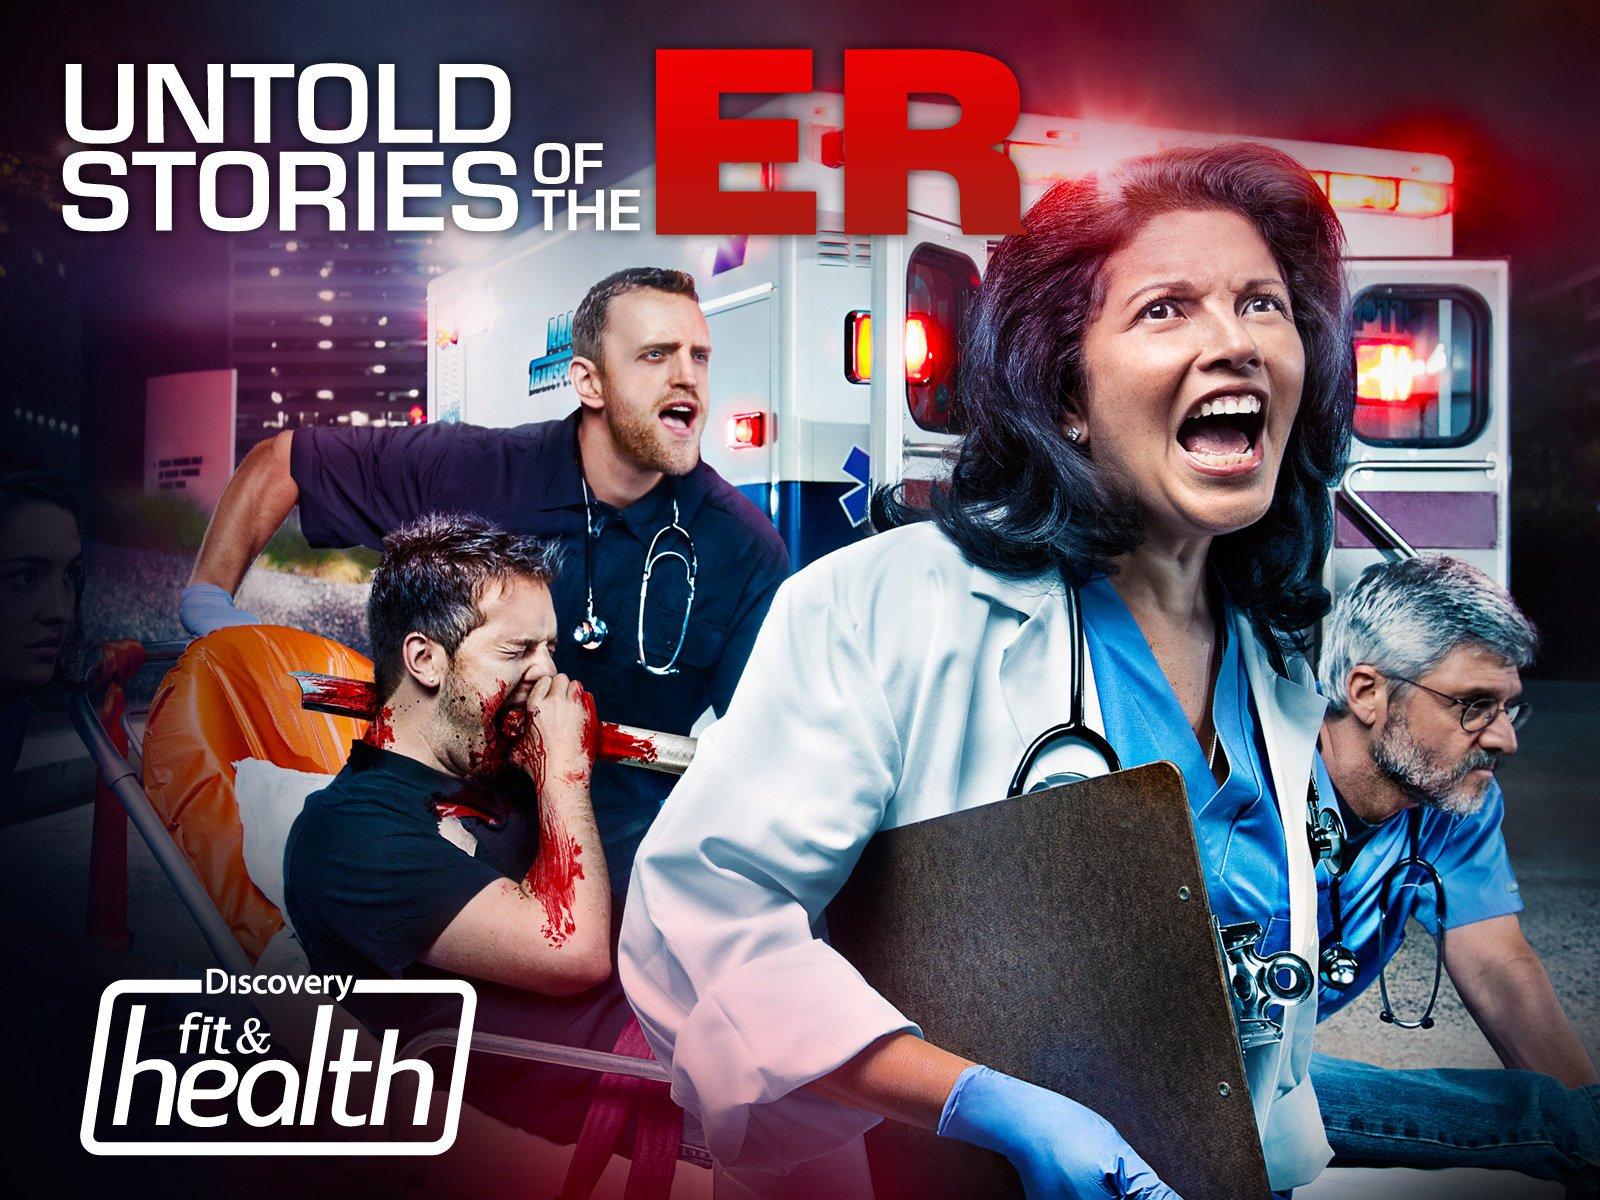 untold stories of the er season 2 online free